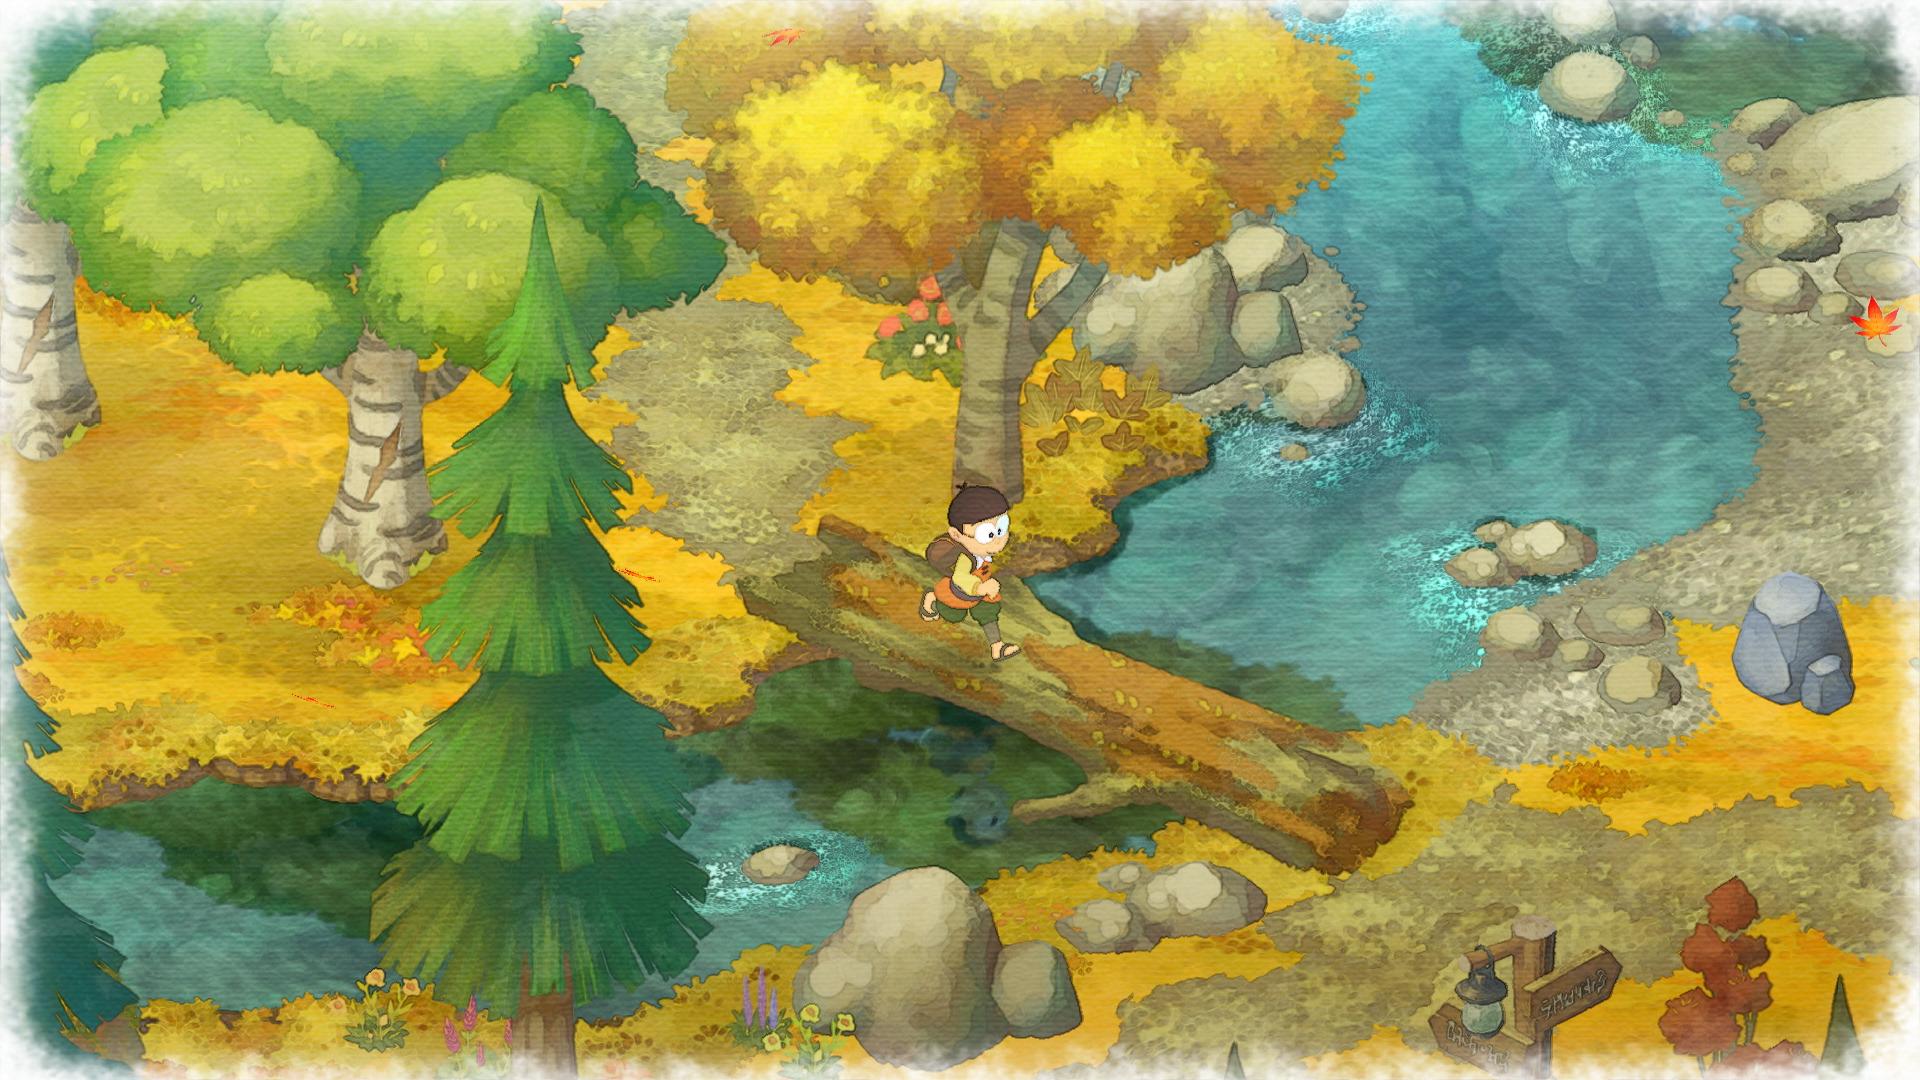 Doraemon_fall_2_1556028535.png